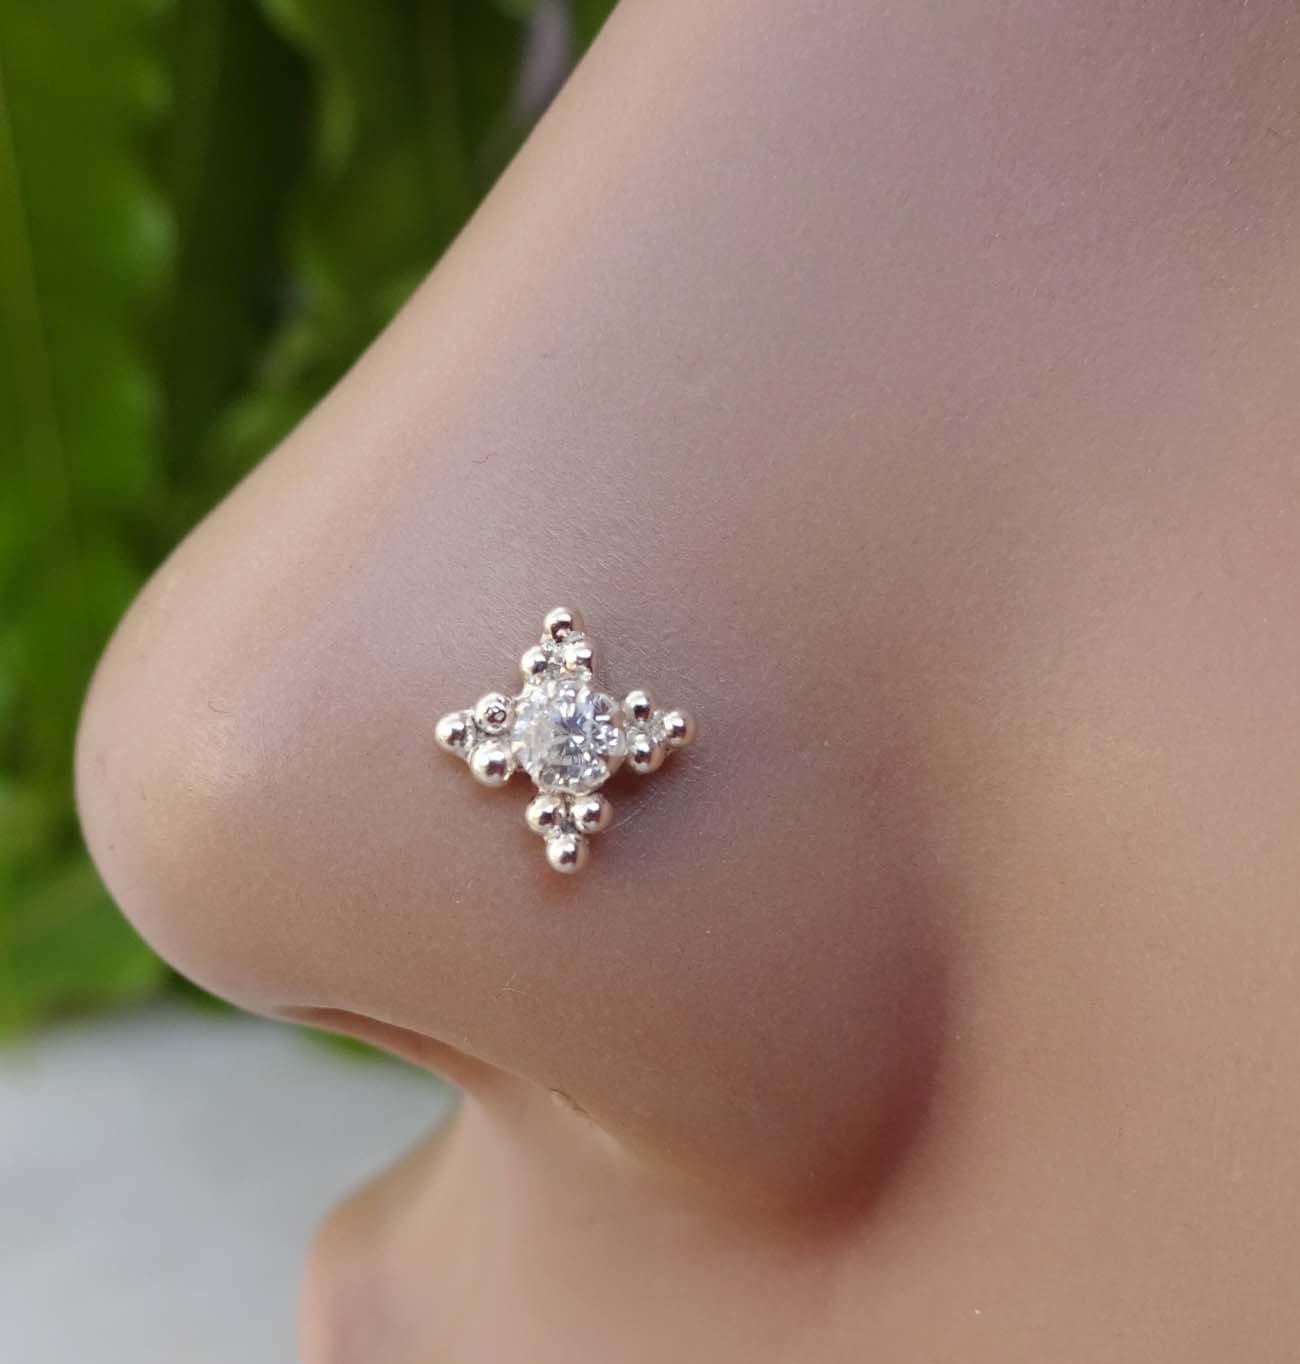 Cute Diamond Nose Piercing,925 Sterling Silver Nose Stud,Flower Nose Piercing,Diamond Nose Screw,Cubic Zirconia,CZ Simulated Diamond Nose Stud,Silver Nose Piercing,Crock Screw Nose Stud(TEJ197)